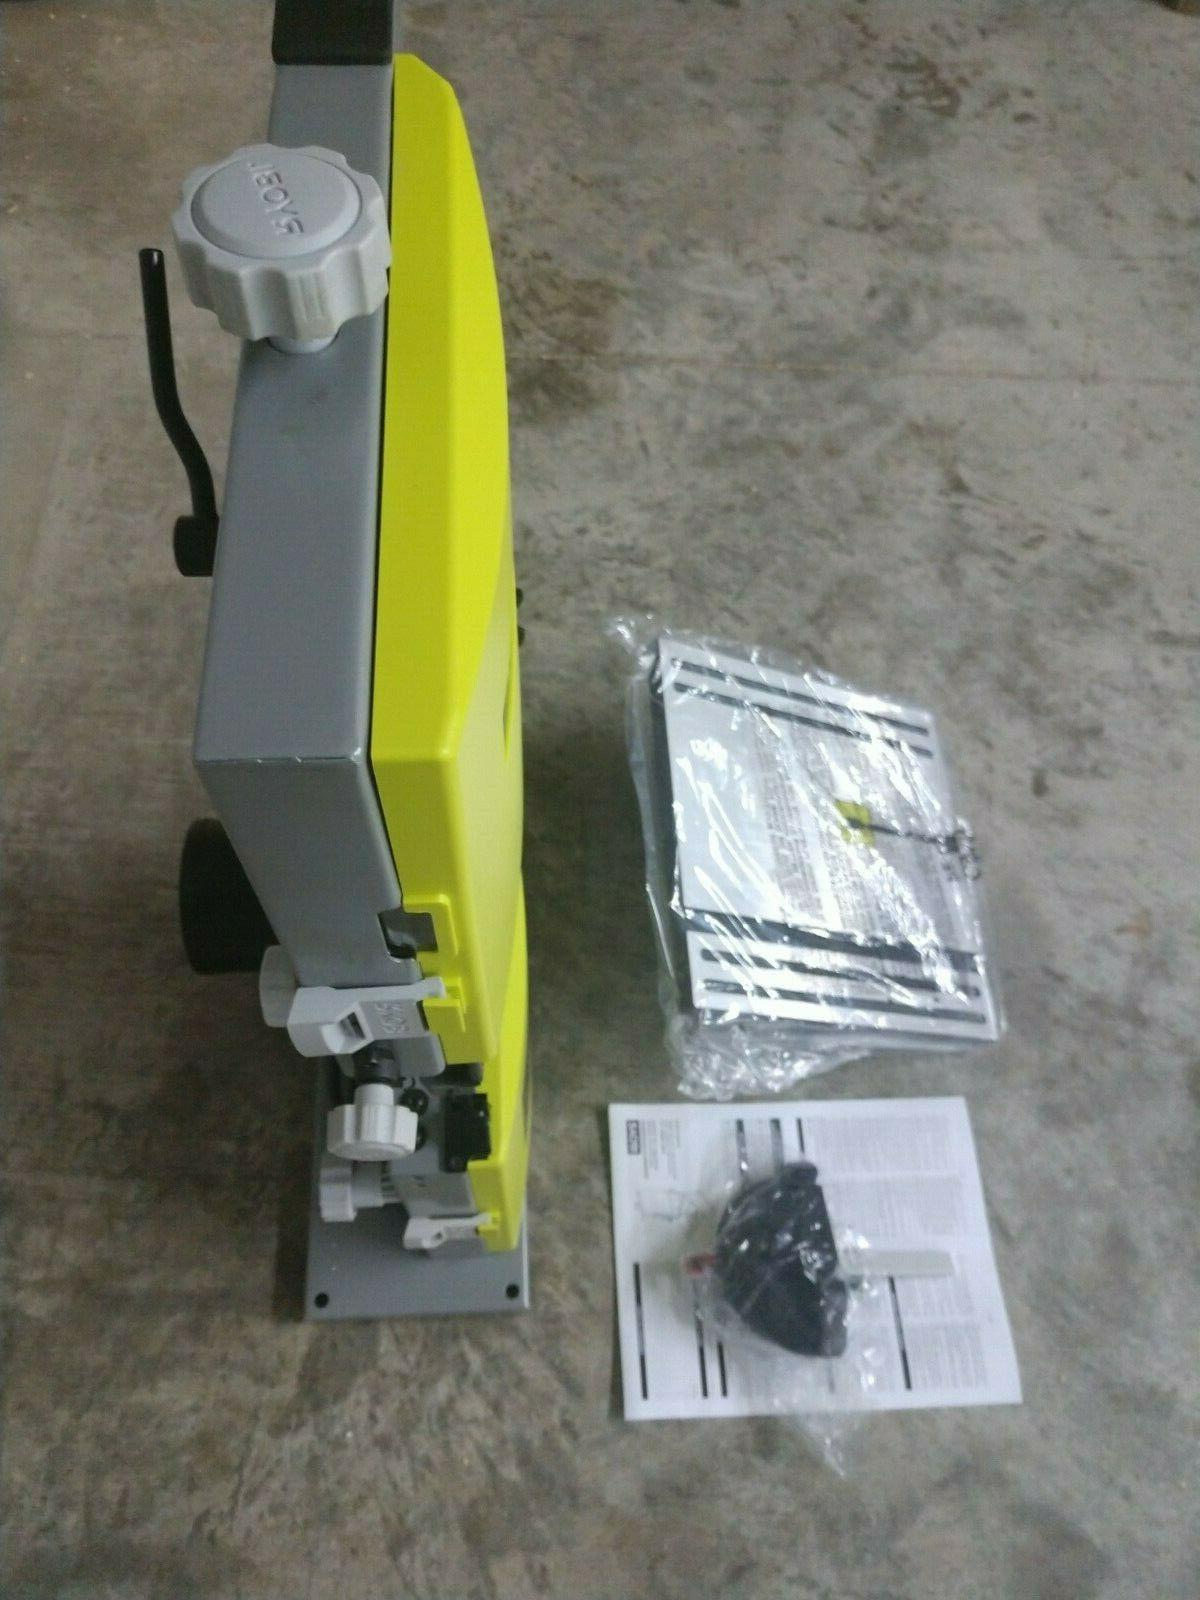 NEW Ryobi 2.5 Amp Saw BS904G